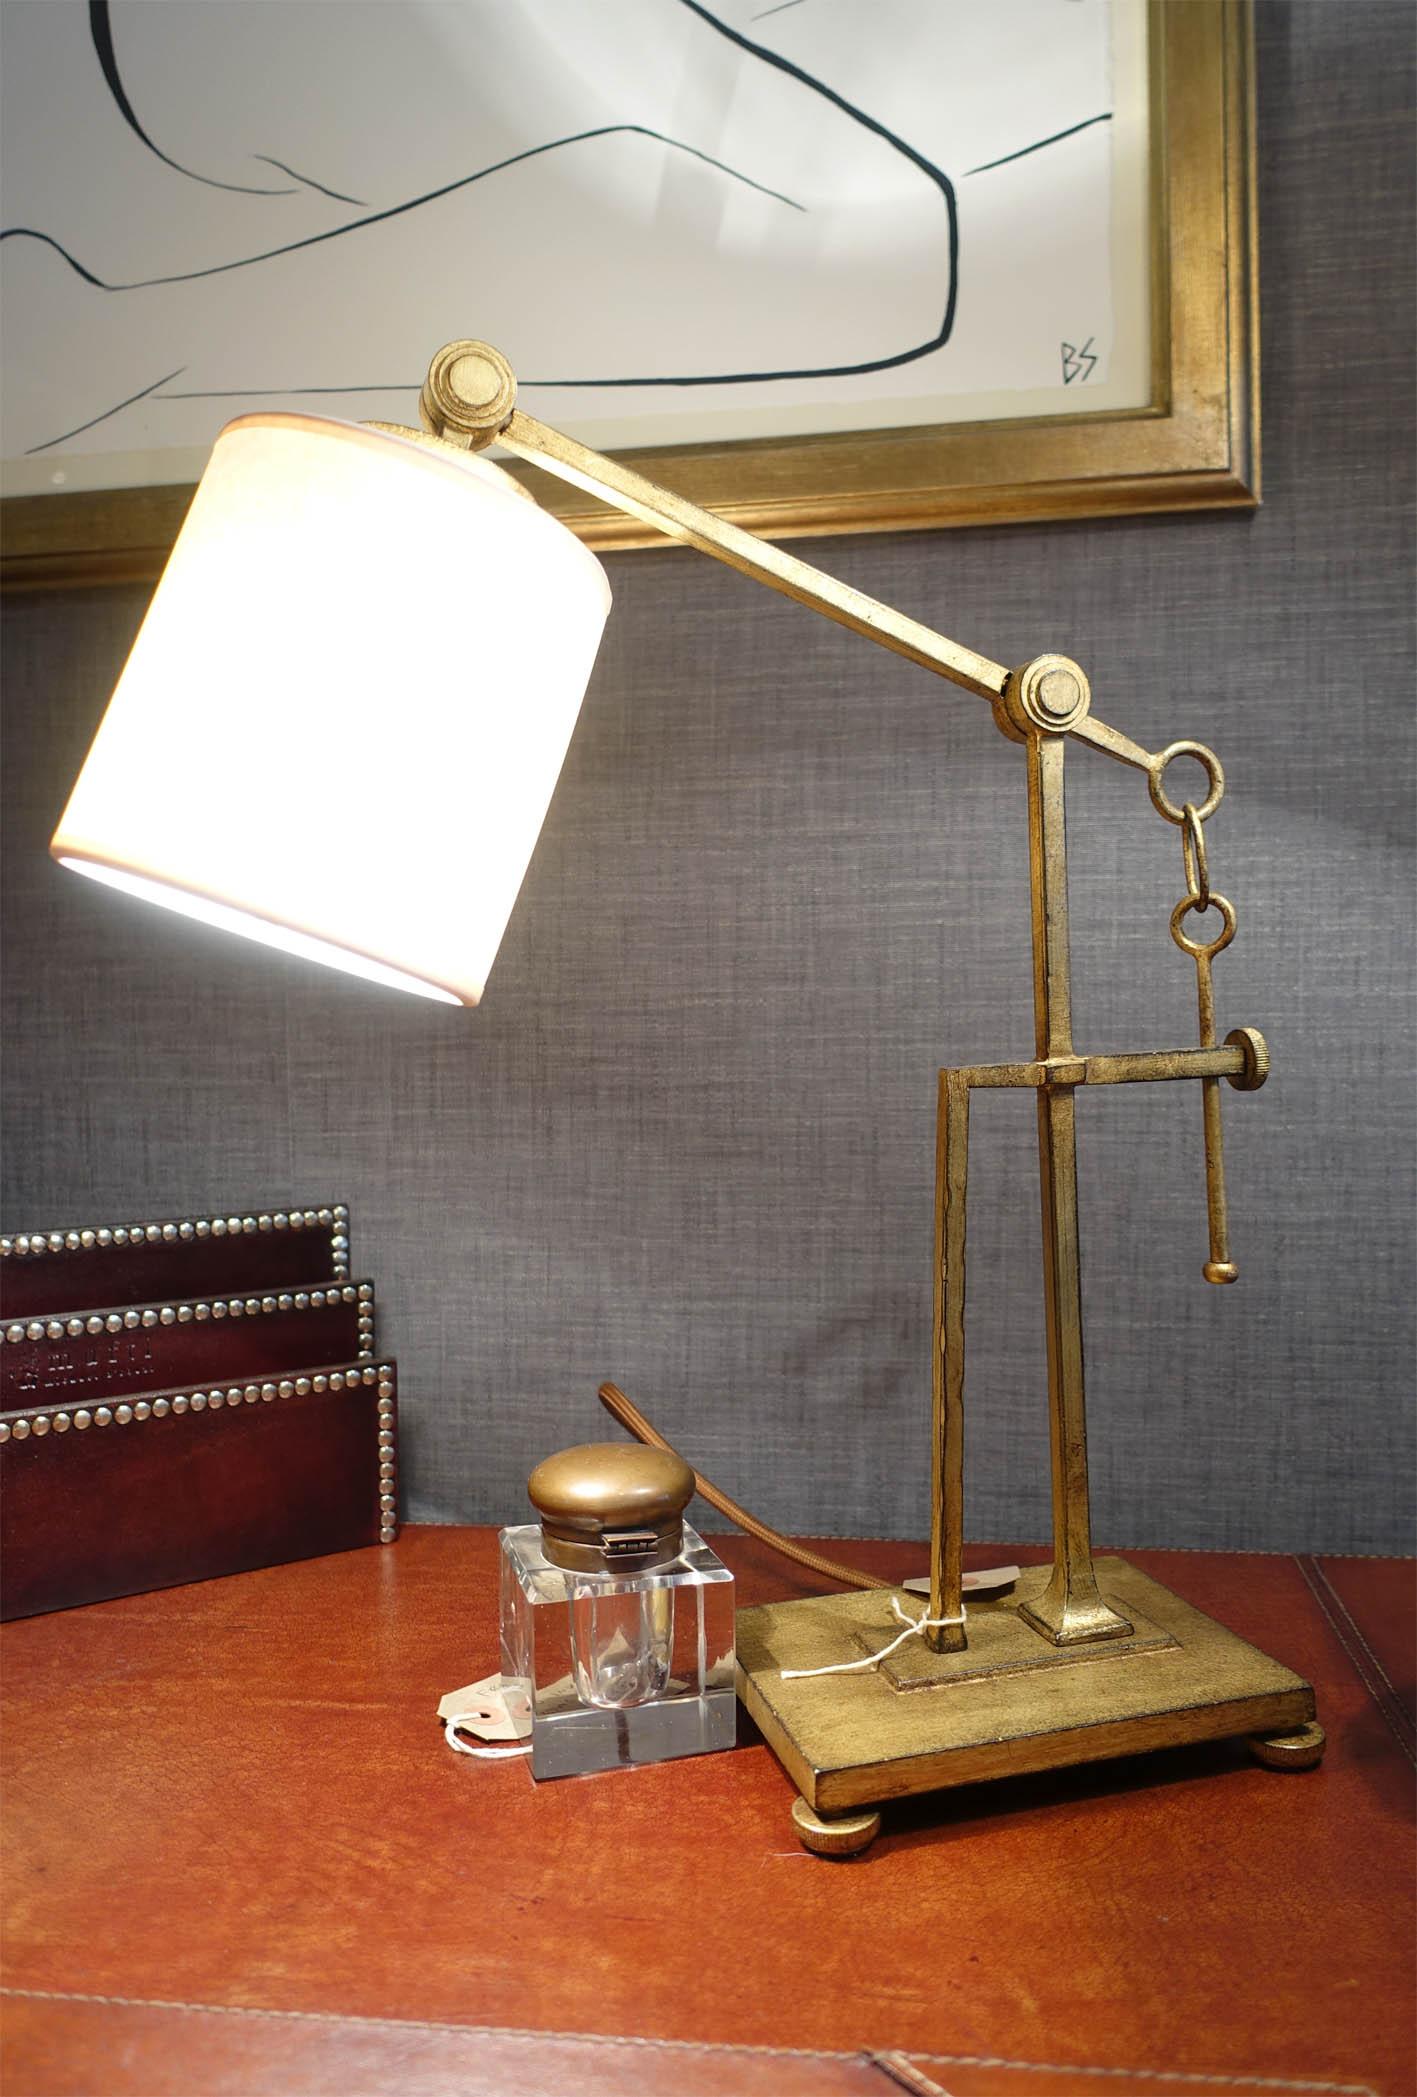 The Aspen table Lamp.